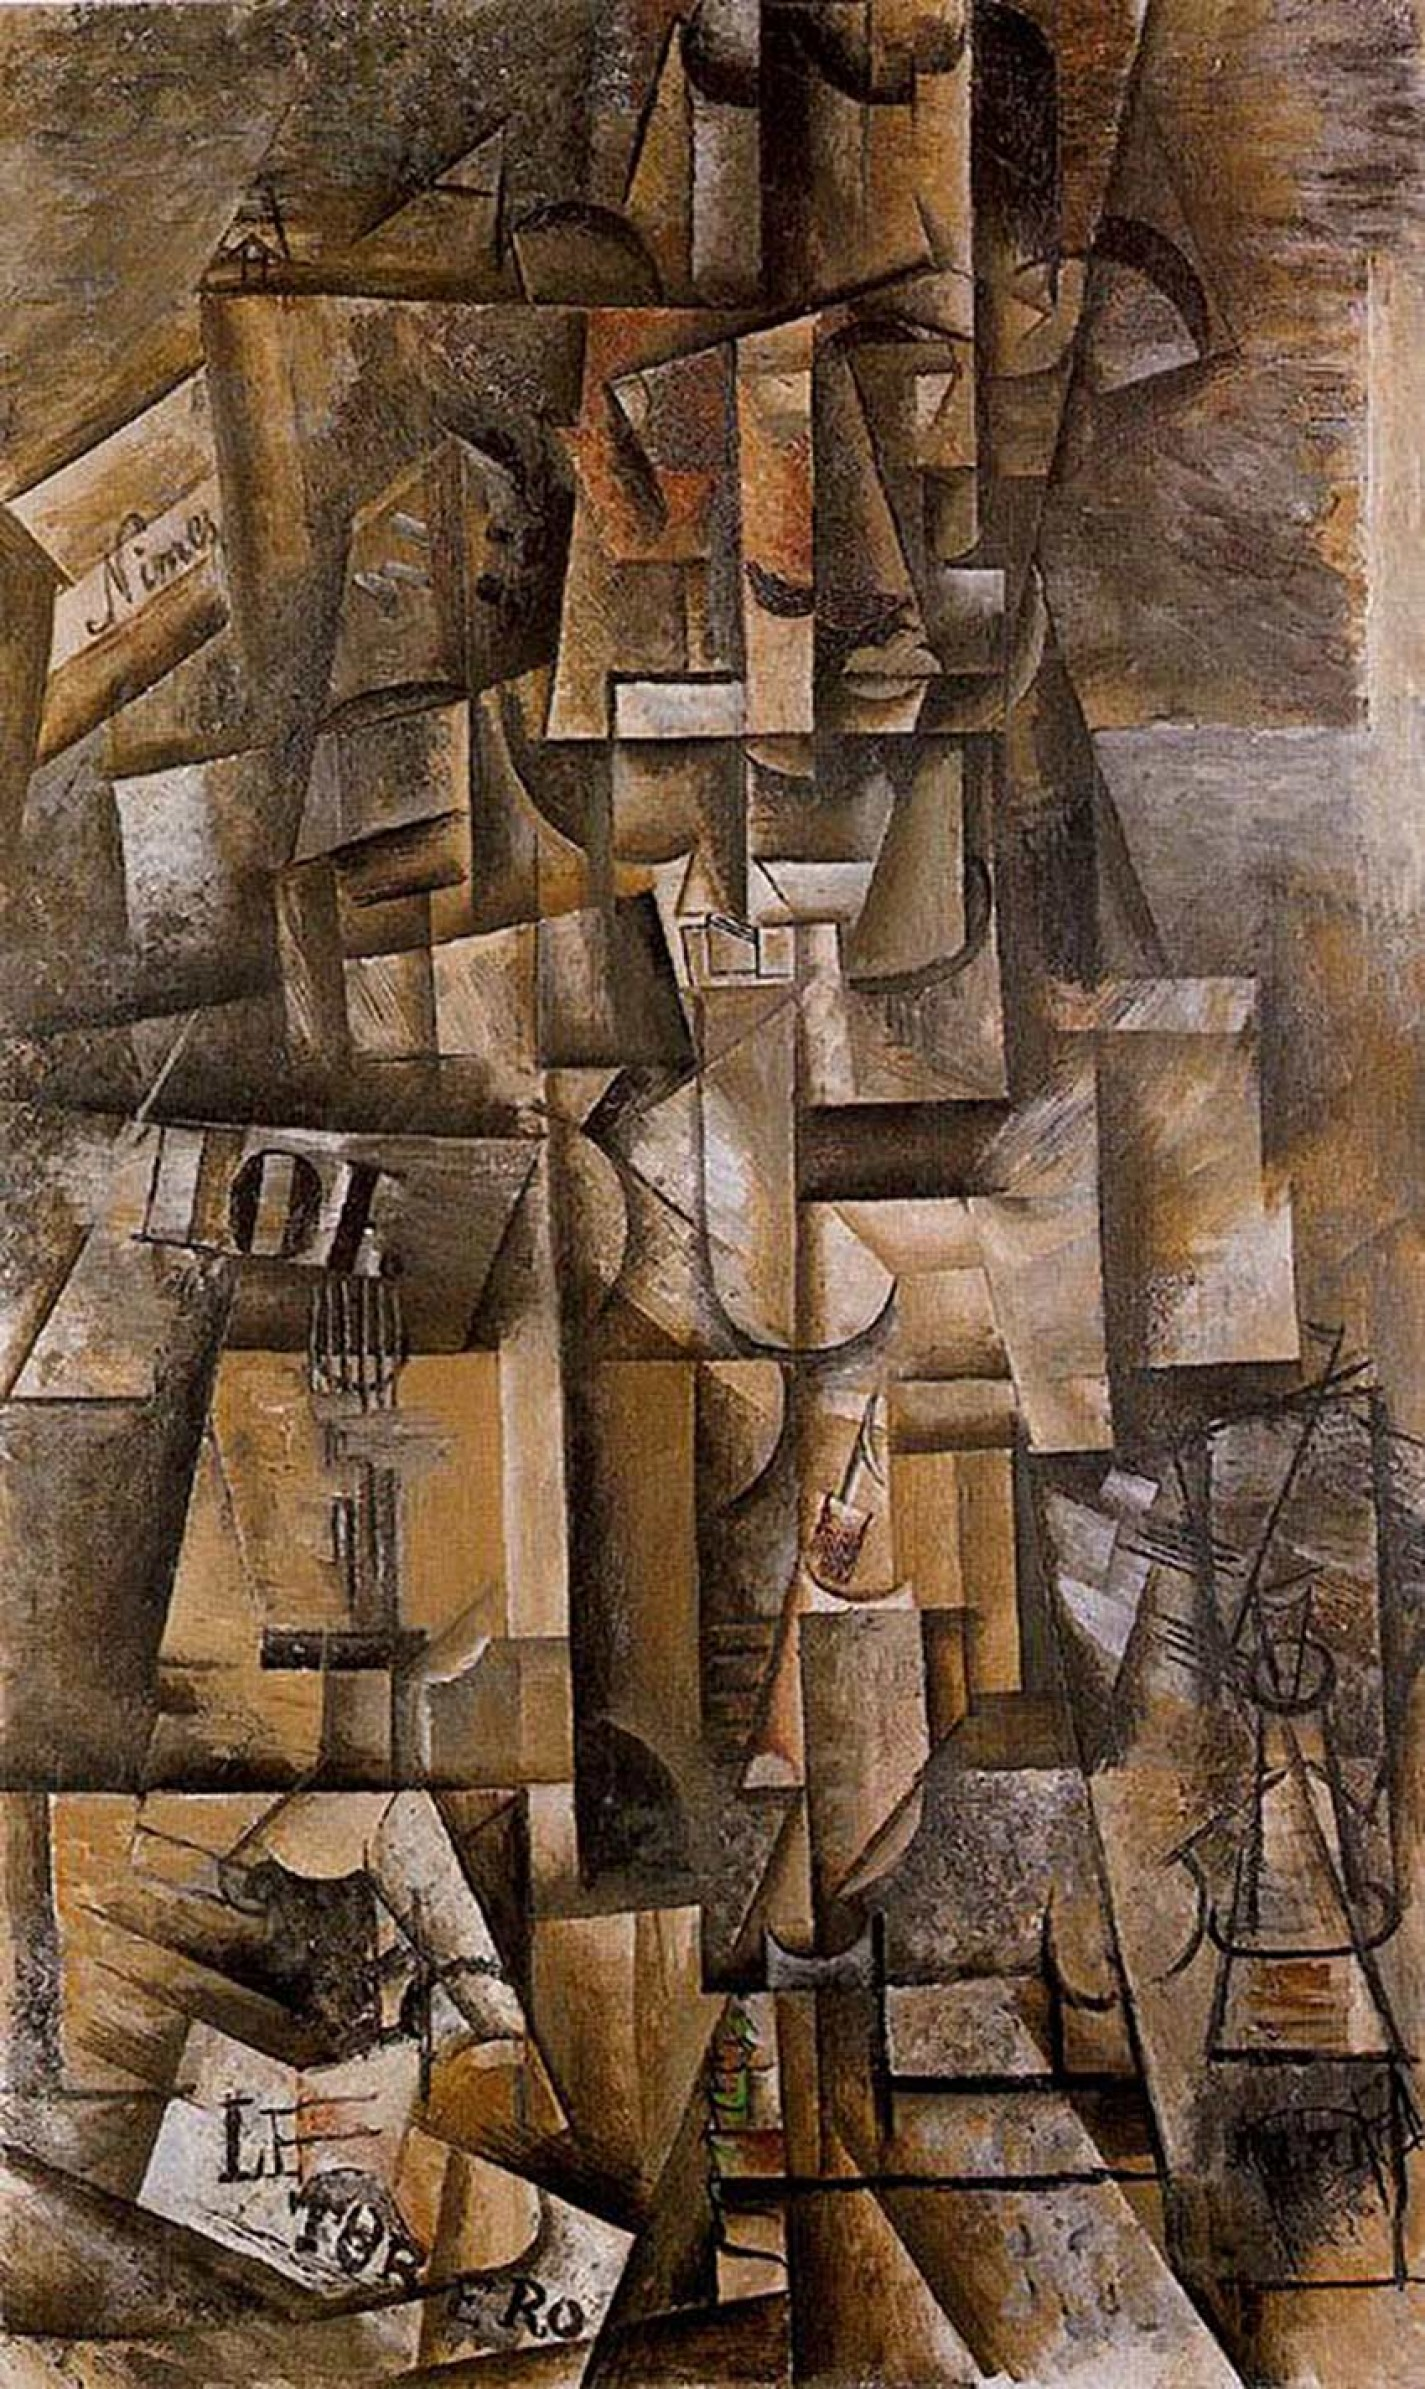 Pablo Picasso  The Torero or the Aficionado, 1912  Oil on canvas, 135x82cm Basle, Kunstmuseum